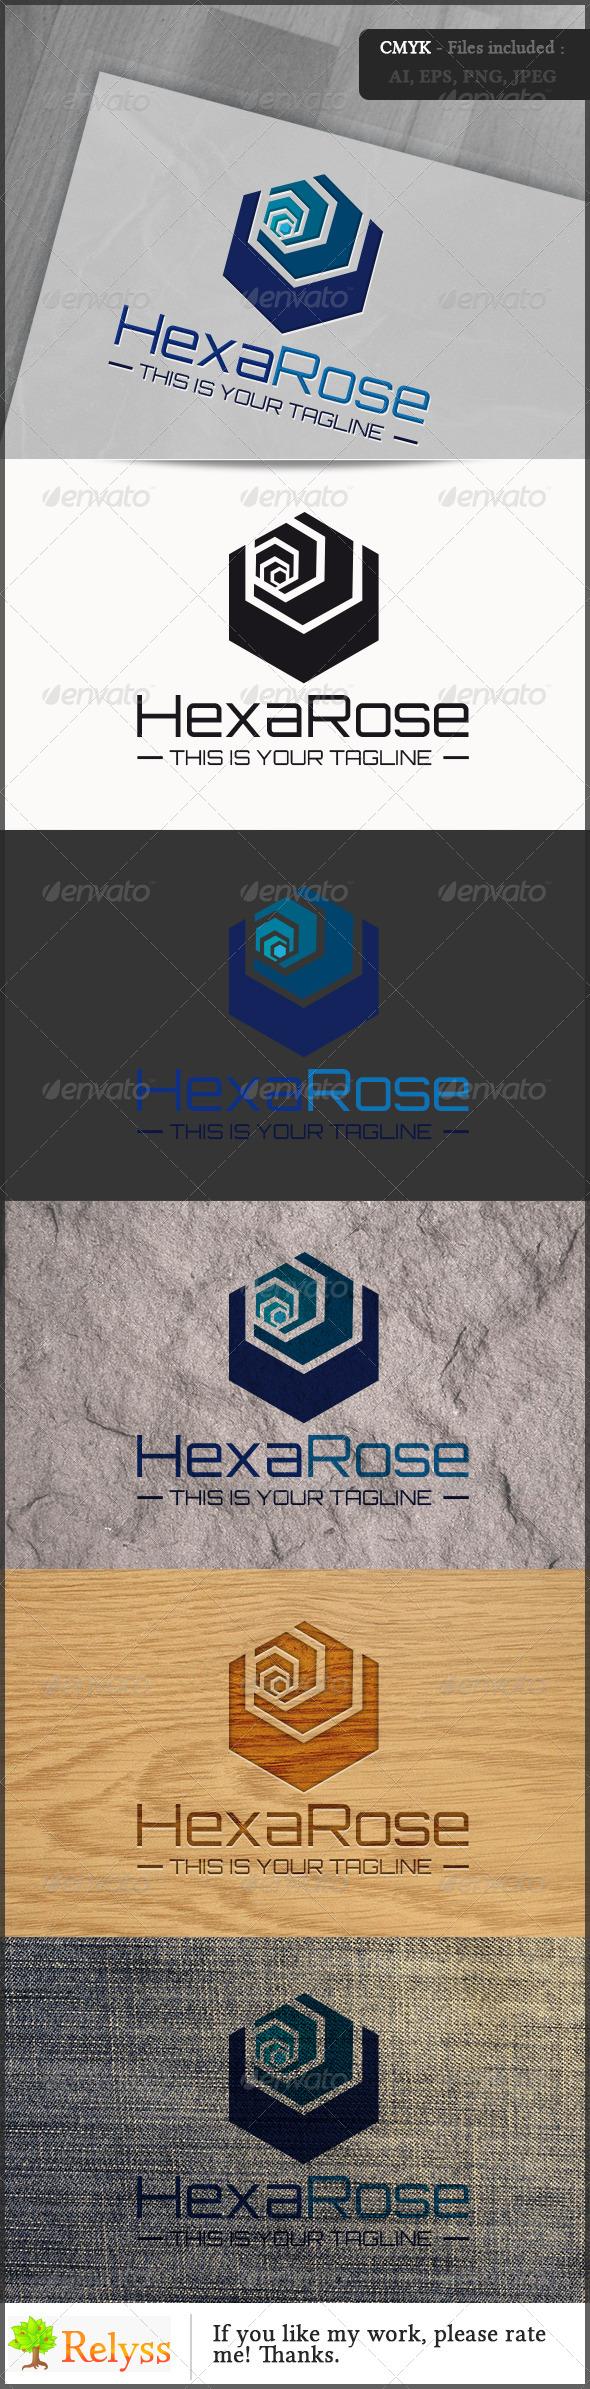 GraphicRiver HexaRose logo 6826469